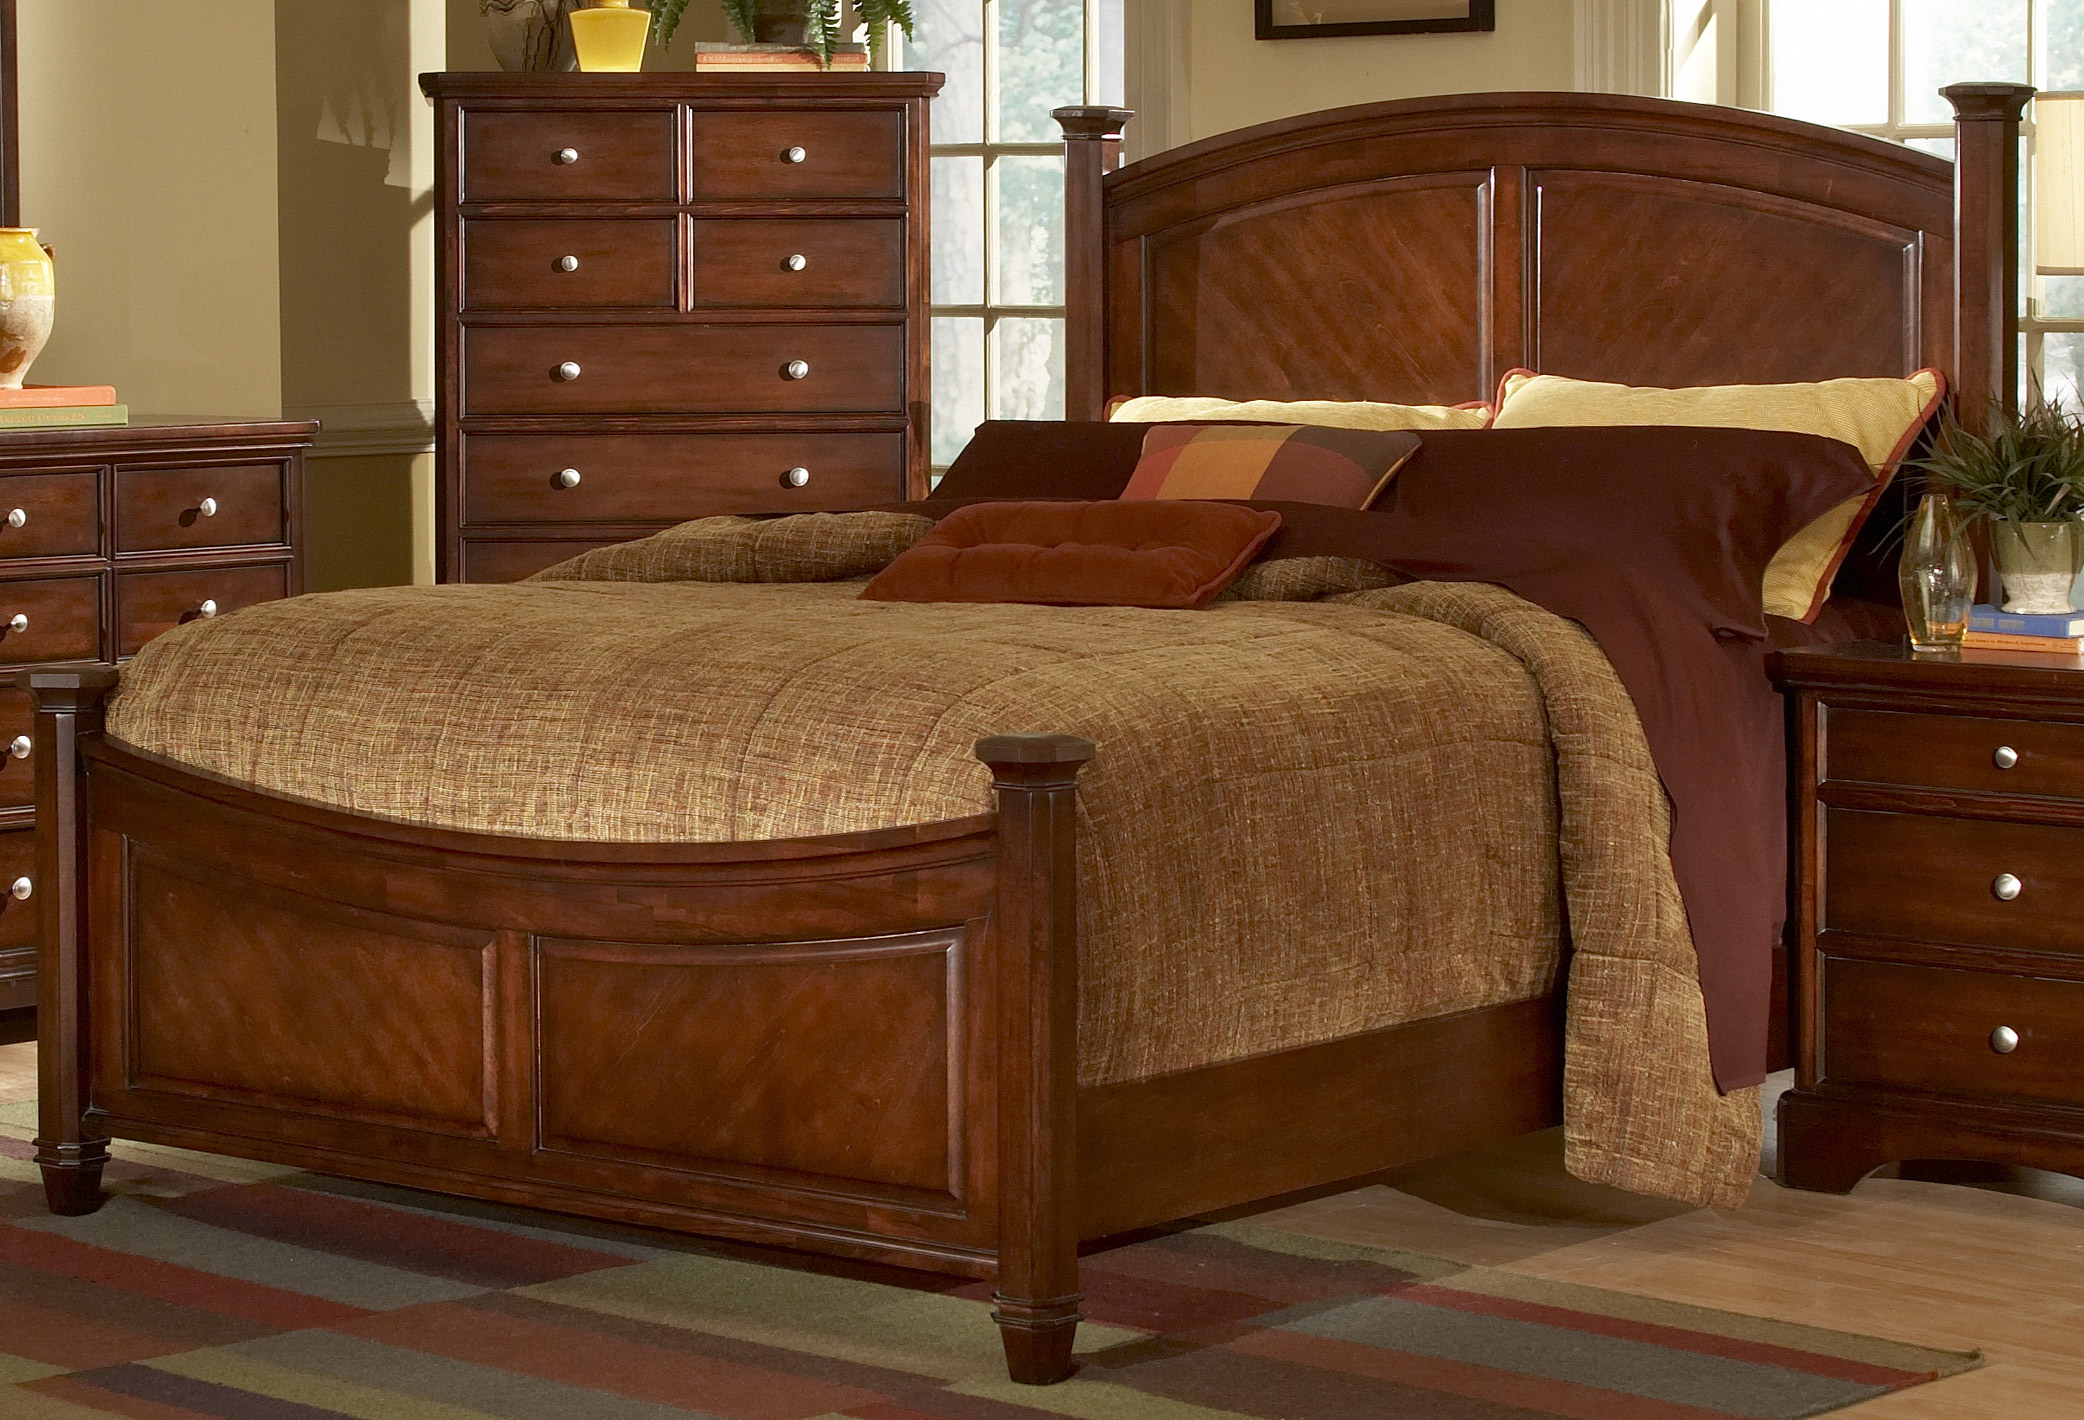 Homelegance Laurel Heights Bed-Cherry